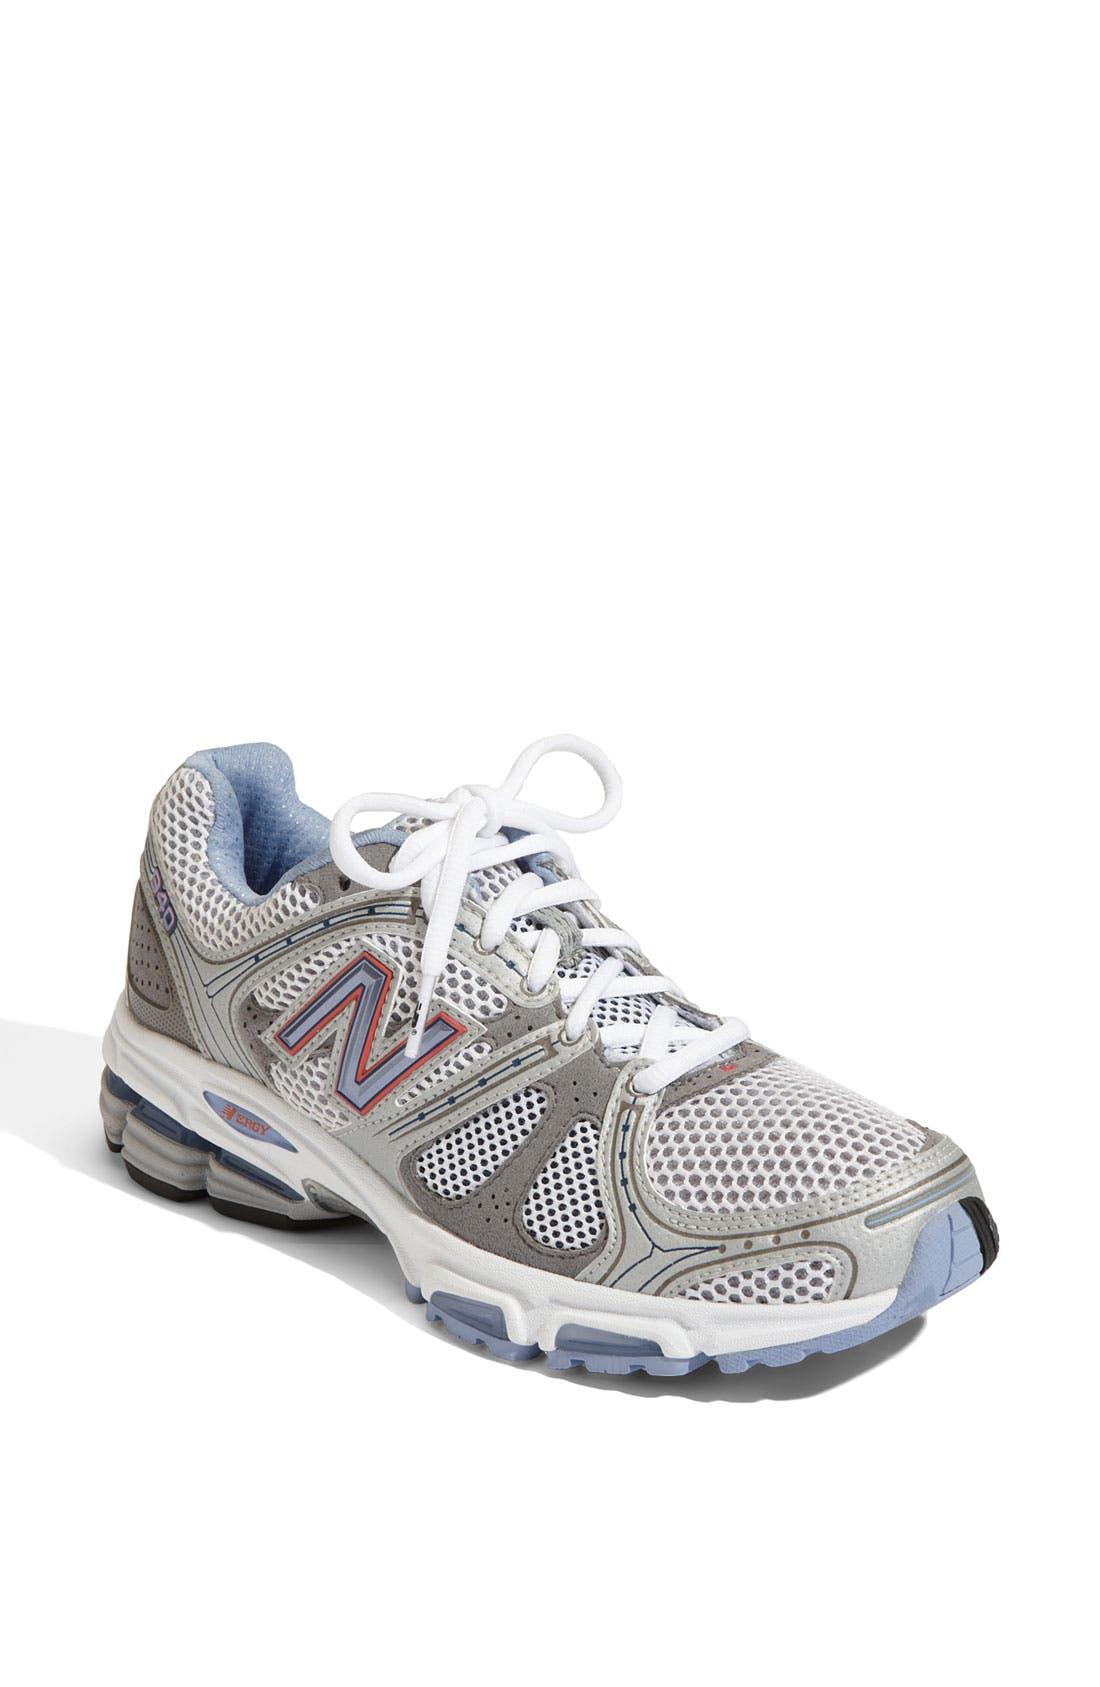 Alternate Image 1 Selected - New Balance '940' Running Shoe (Women)